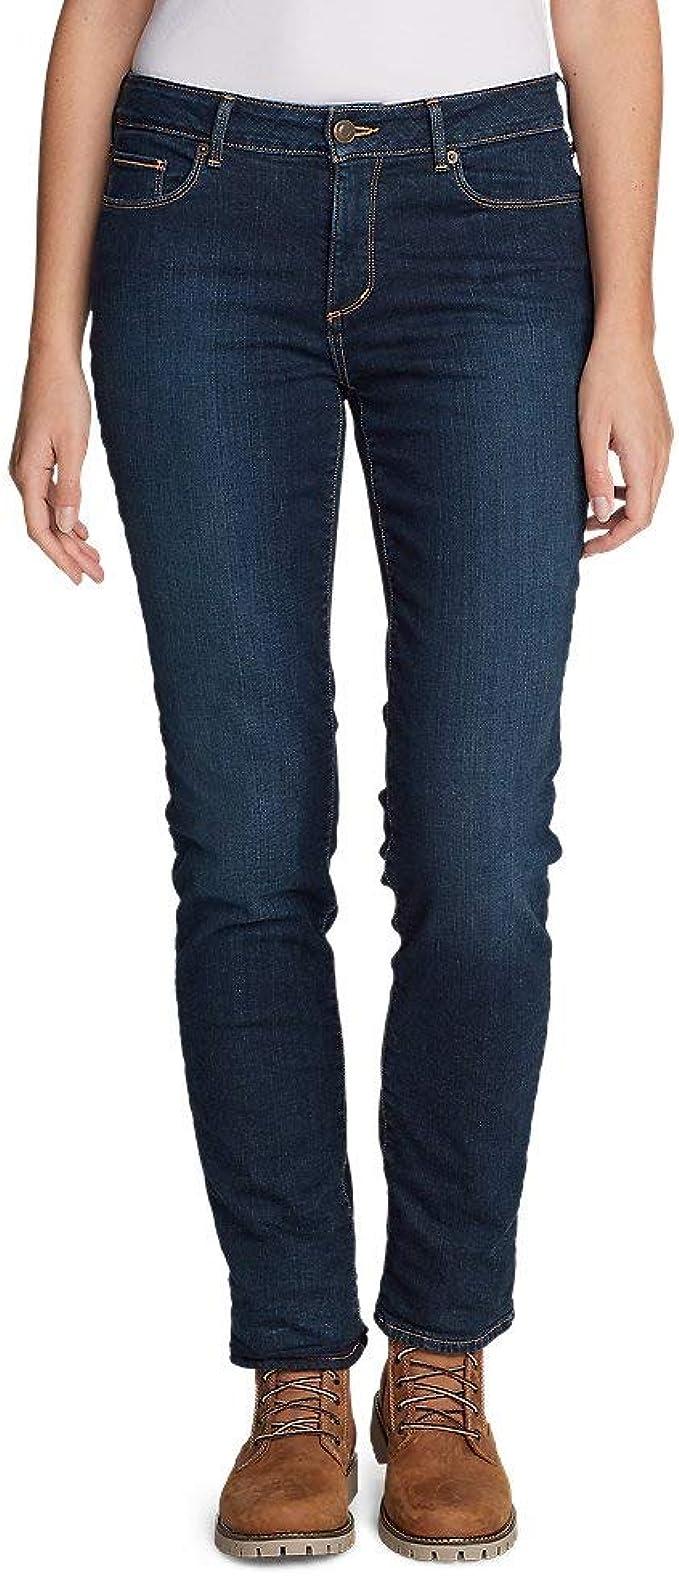 Slightly Curvy Eddie Bauer Womens StayShape Slim Straight Fleece-Lined Jeans